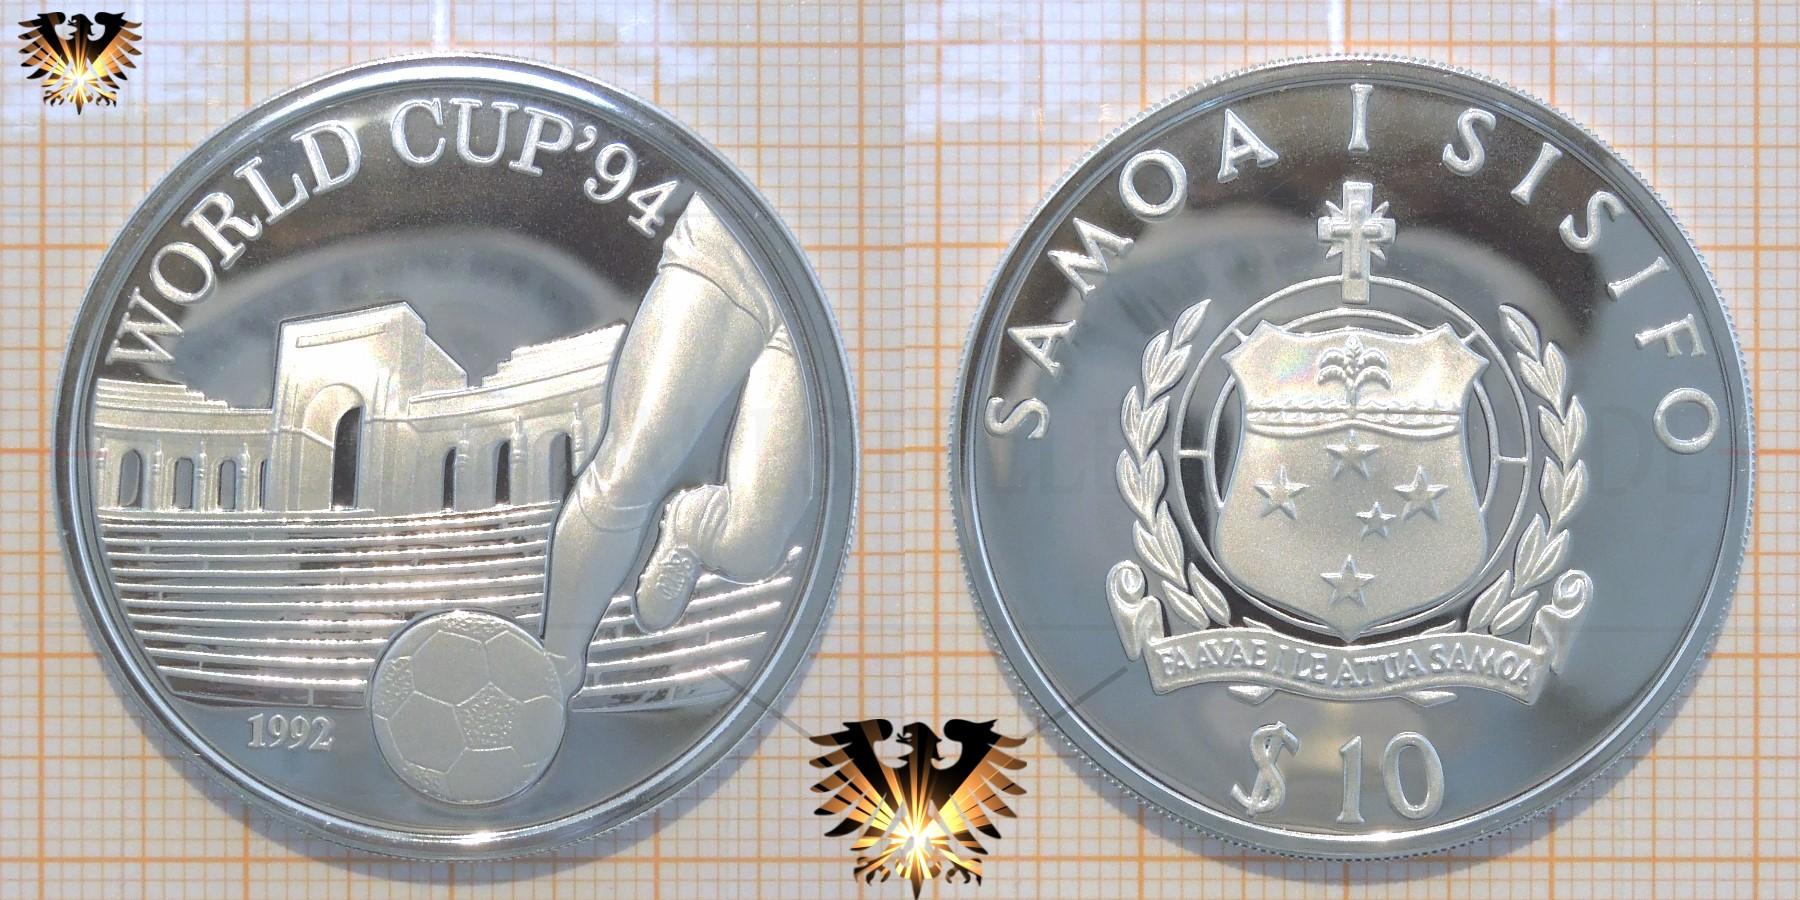 10 Dollars 1992 Samoa I Sisifo World Cup94 Stadion Münze Silber